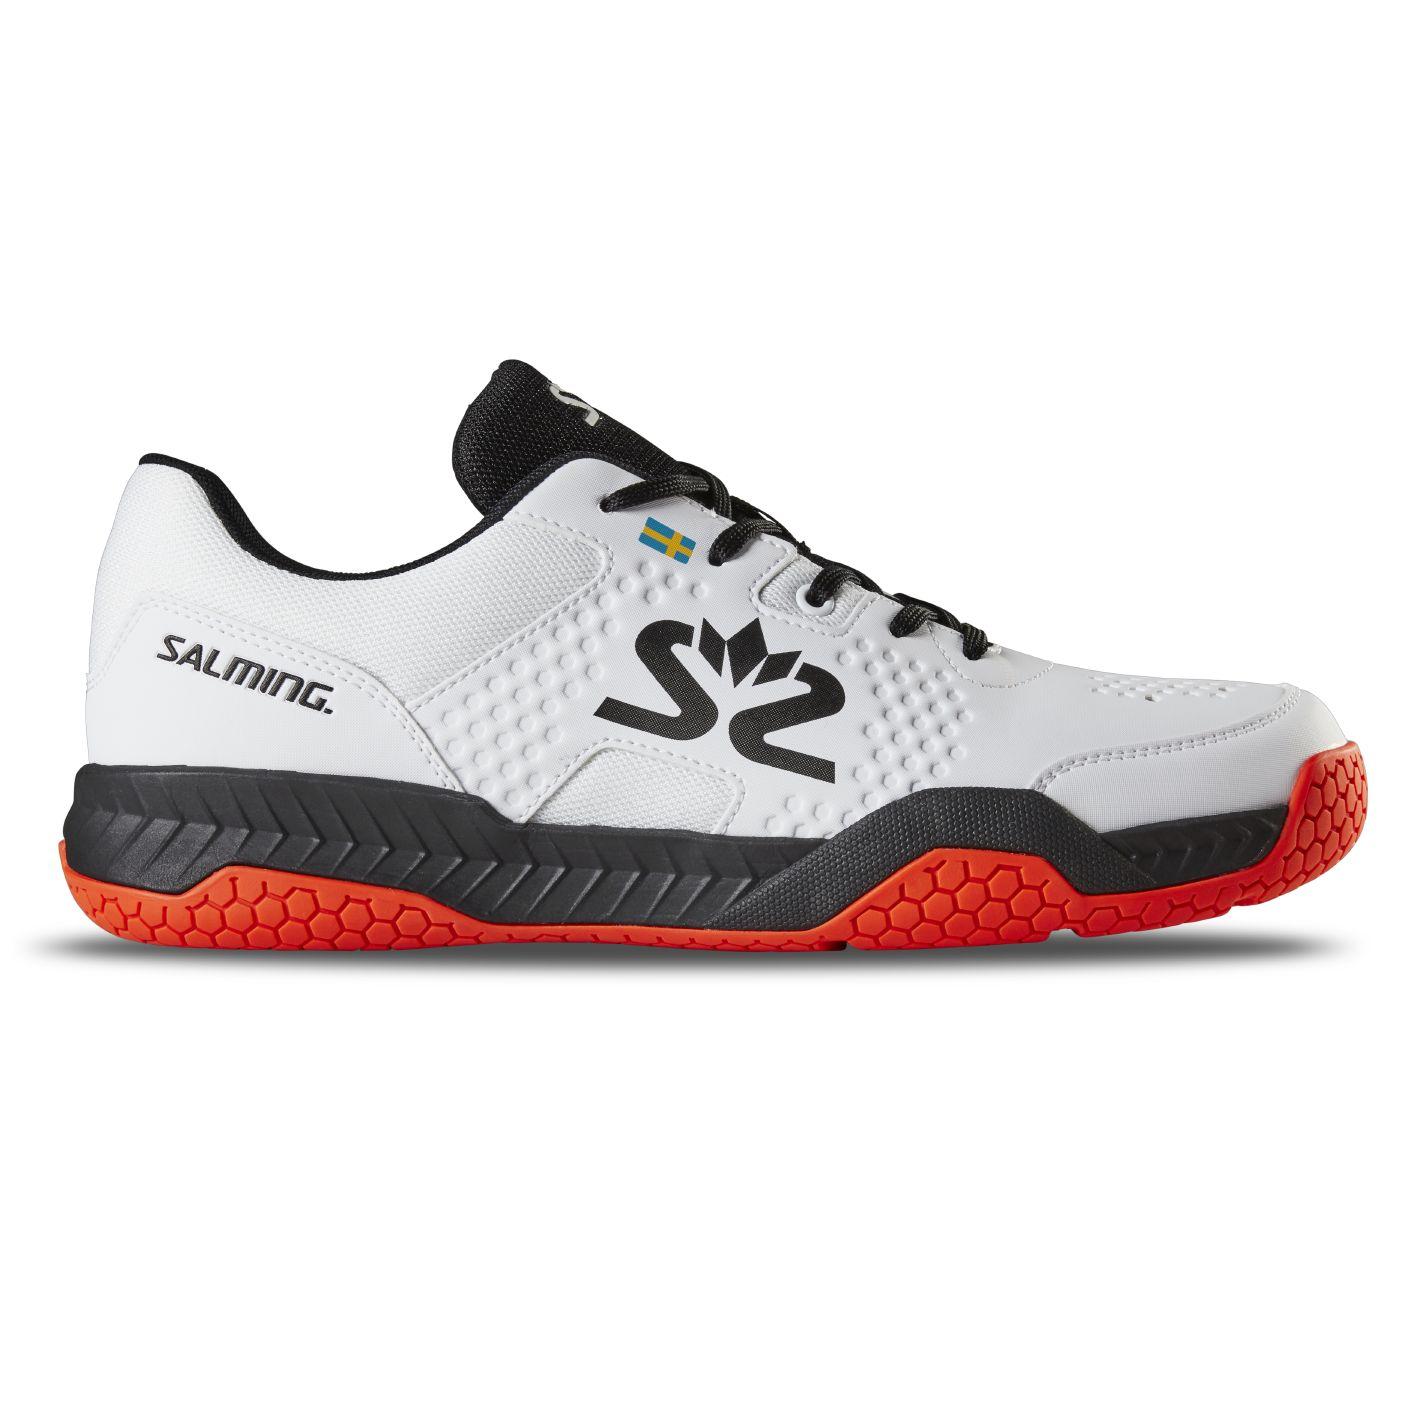 Salming Hawk Court Shoe Men White/Black 10 UK - 45 1/3 EUR - 29 cm